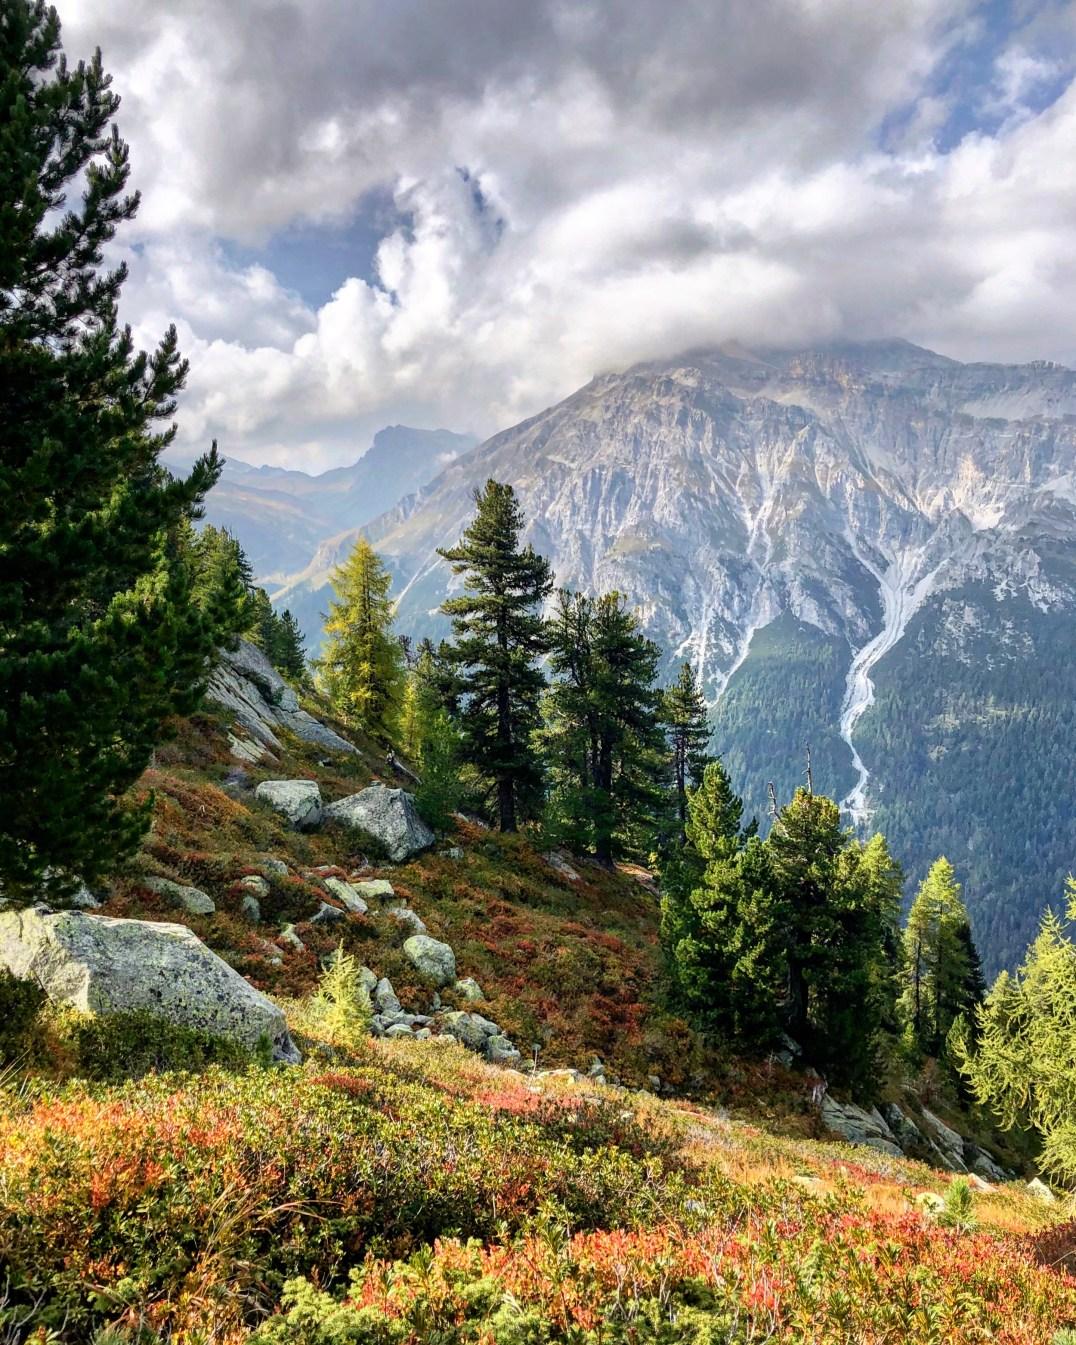 Wanderung_Surettasee_Bergwelt